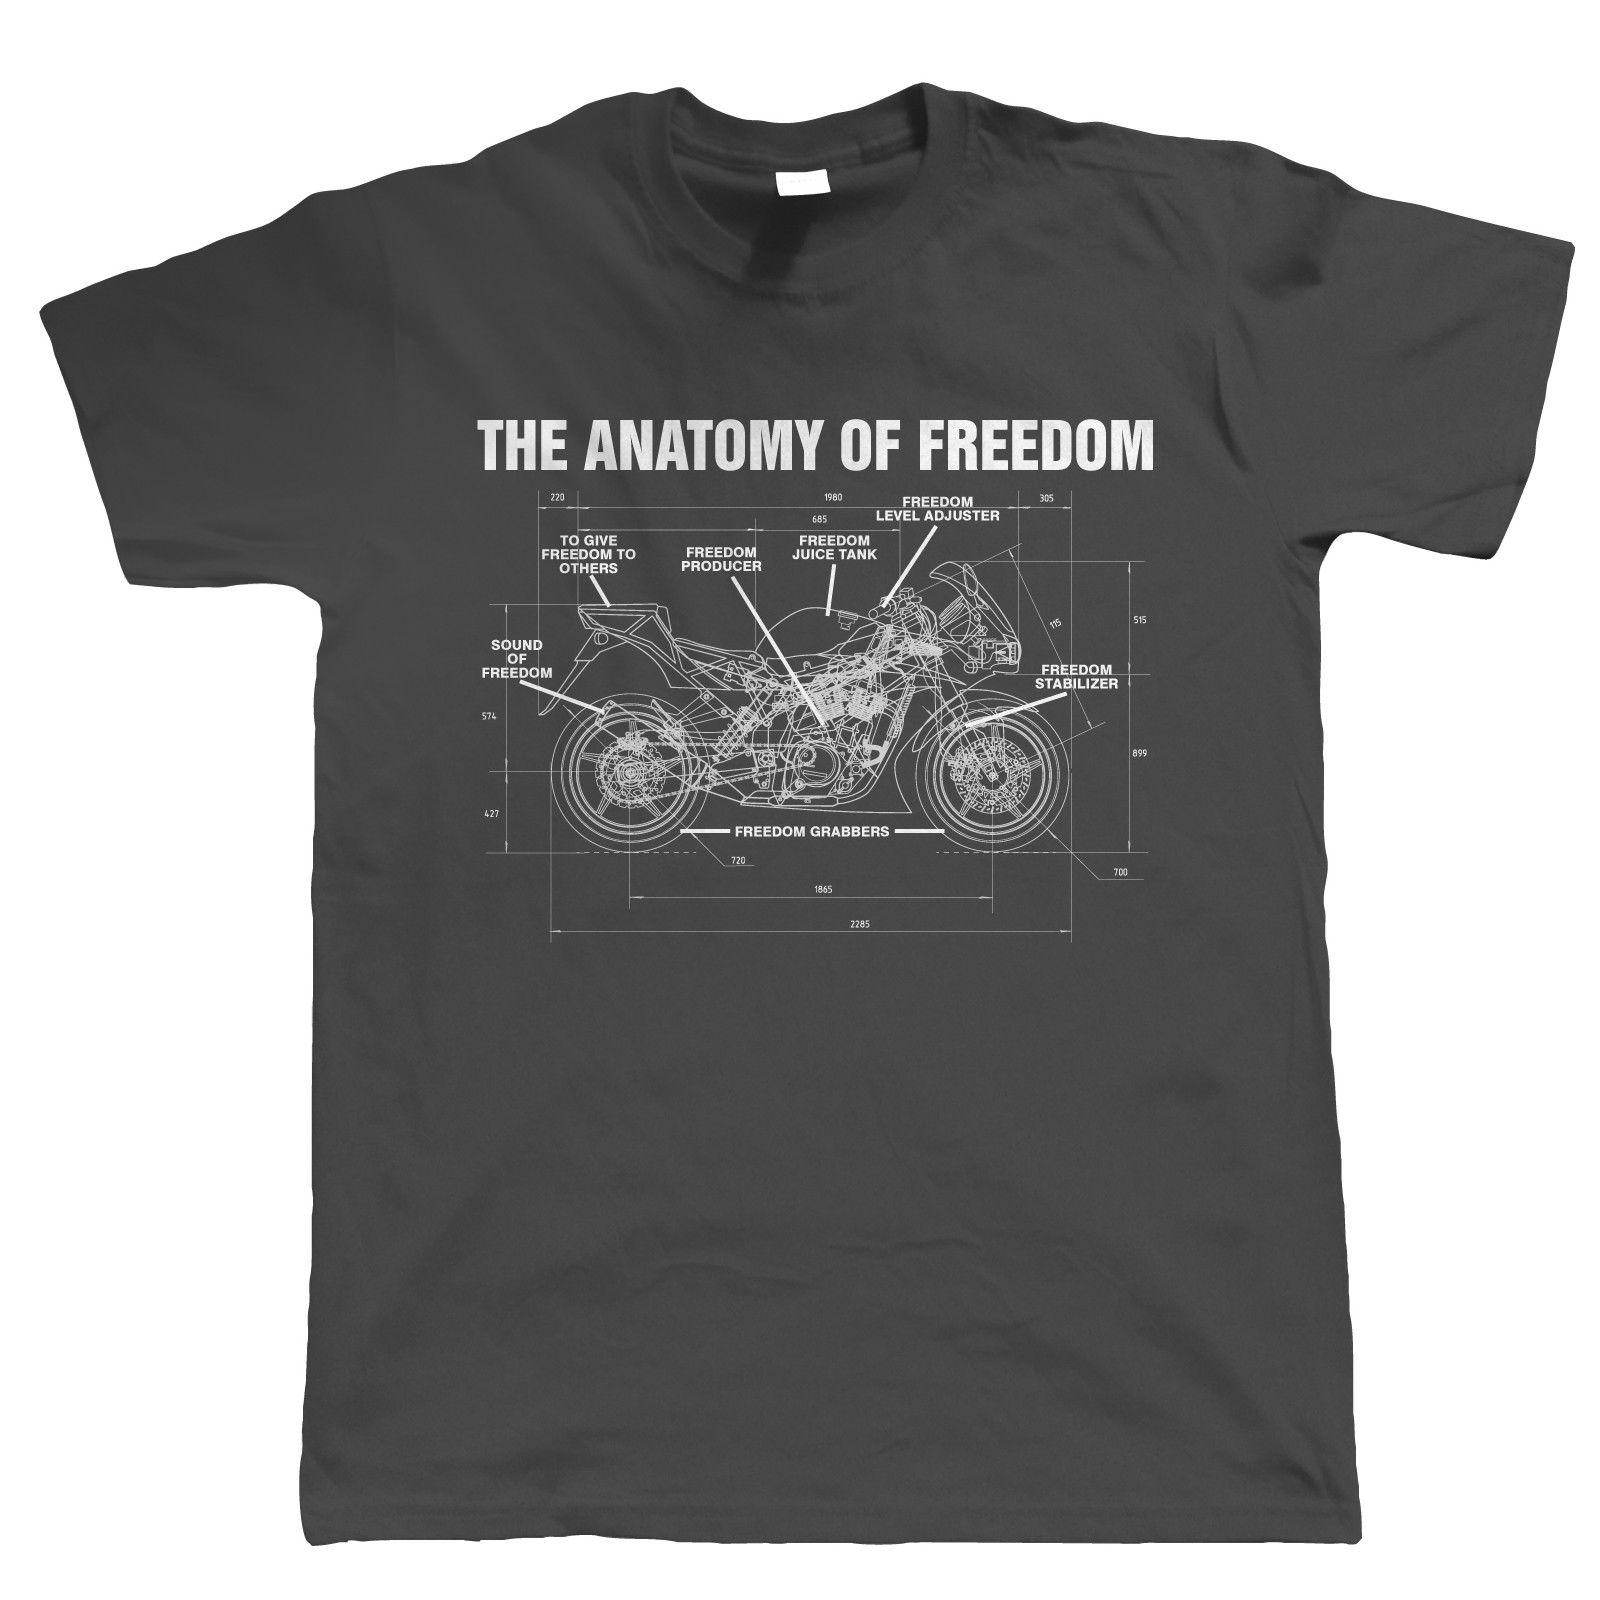 Hot New 2019 Summer Fashion Anatomy of Freedom Mens Biker T Shirt - Superbike Motorcycle TT Gift for Him Dad Tee Shirt